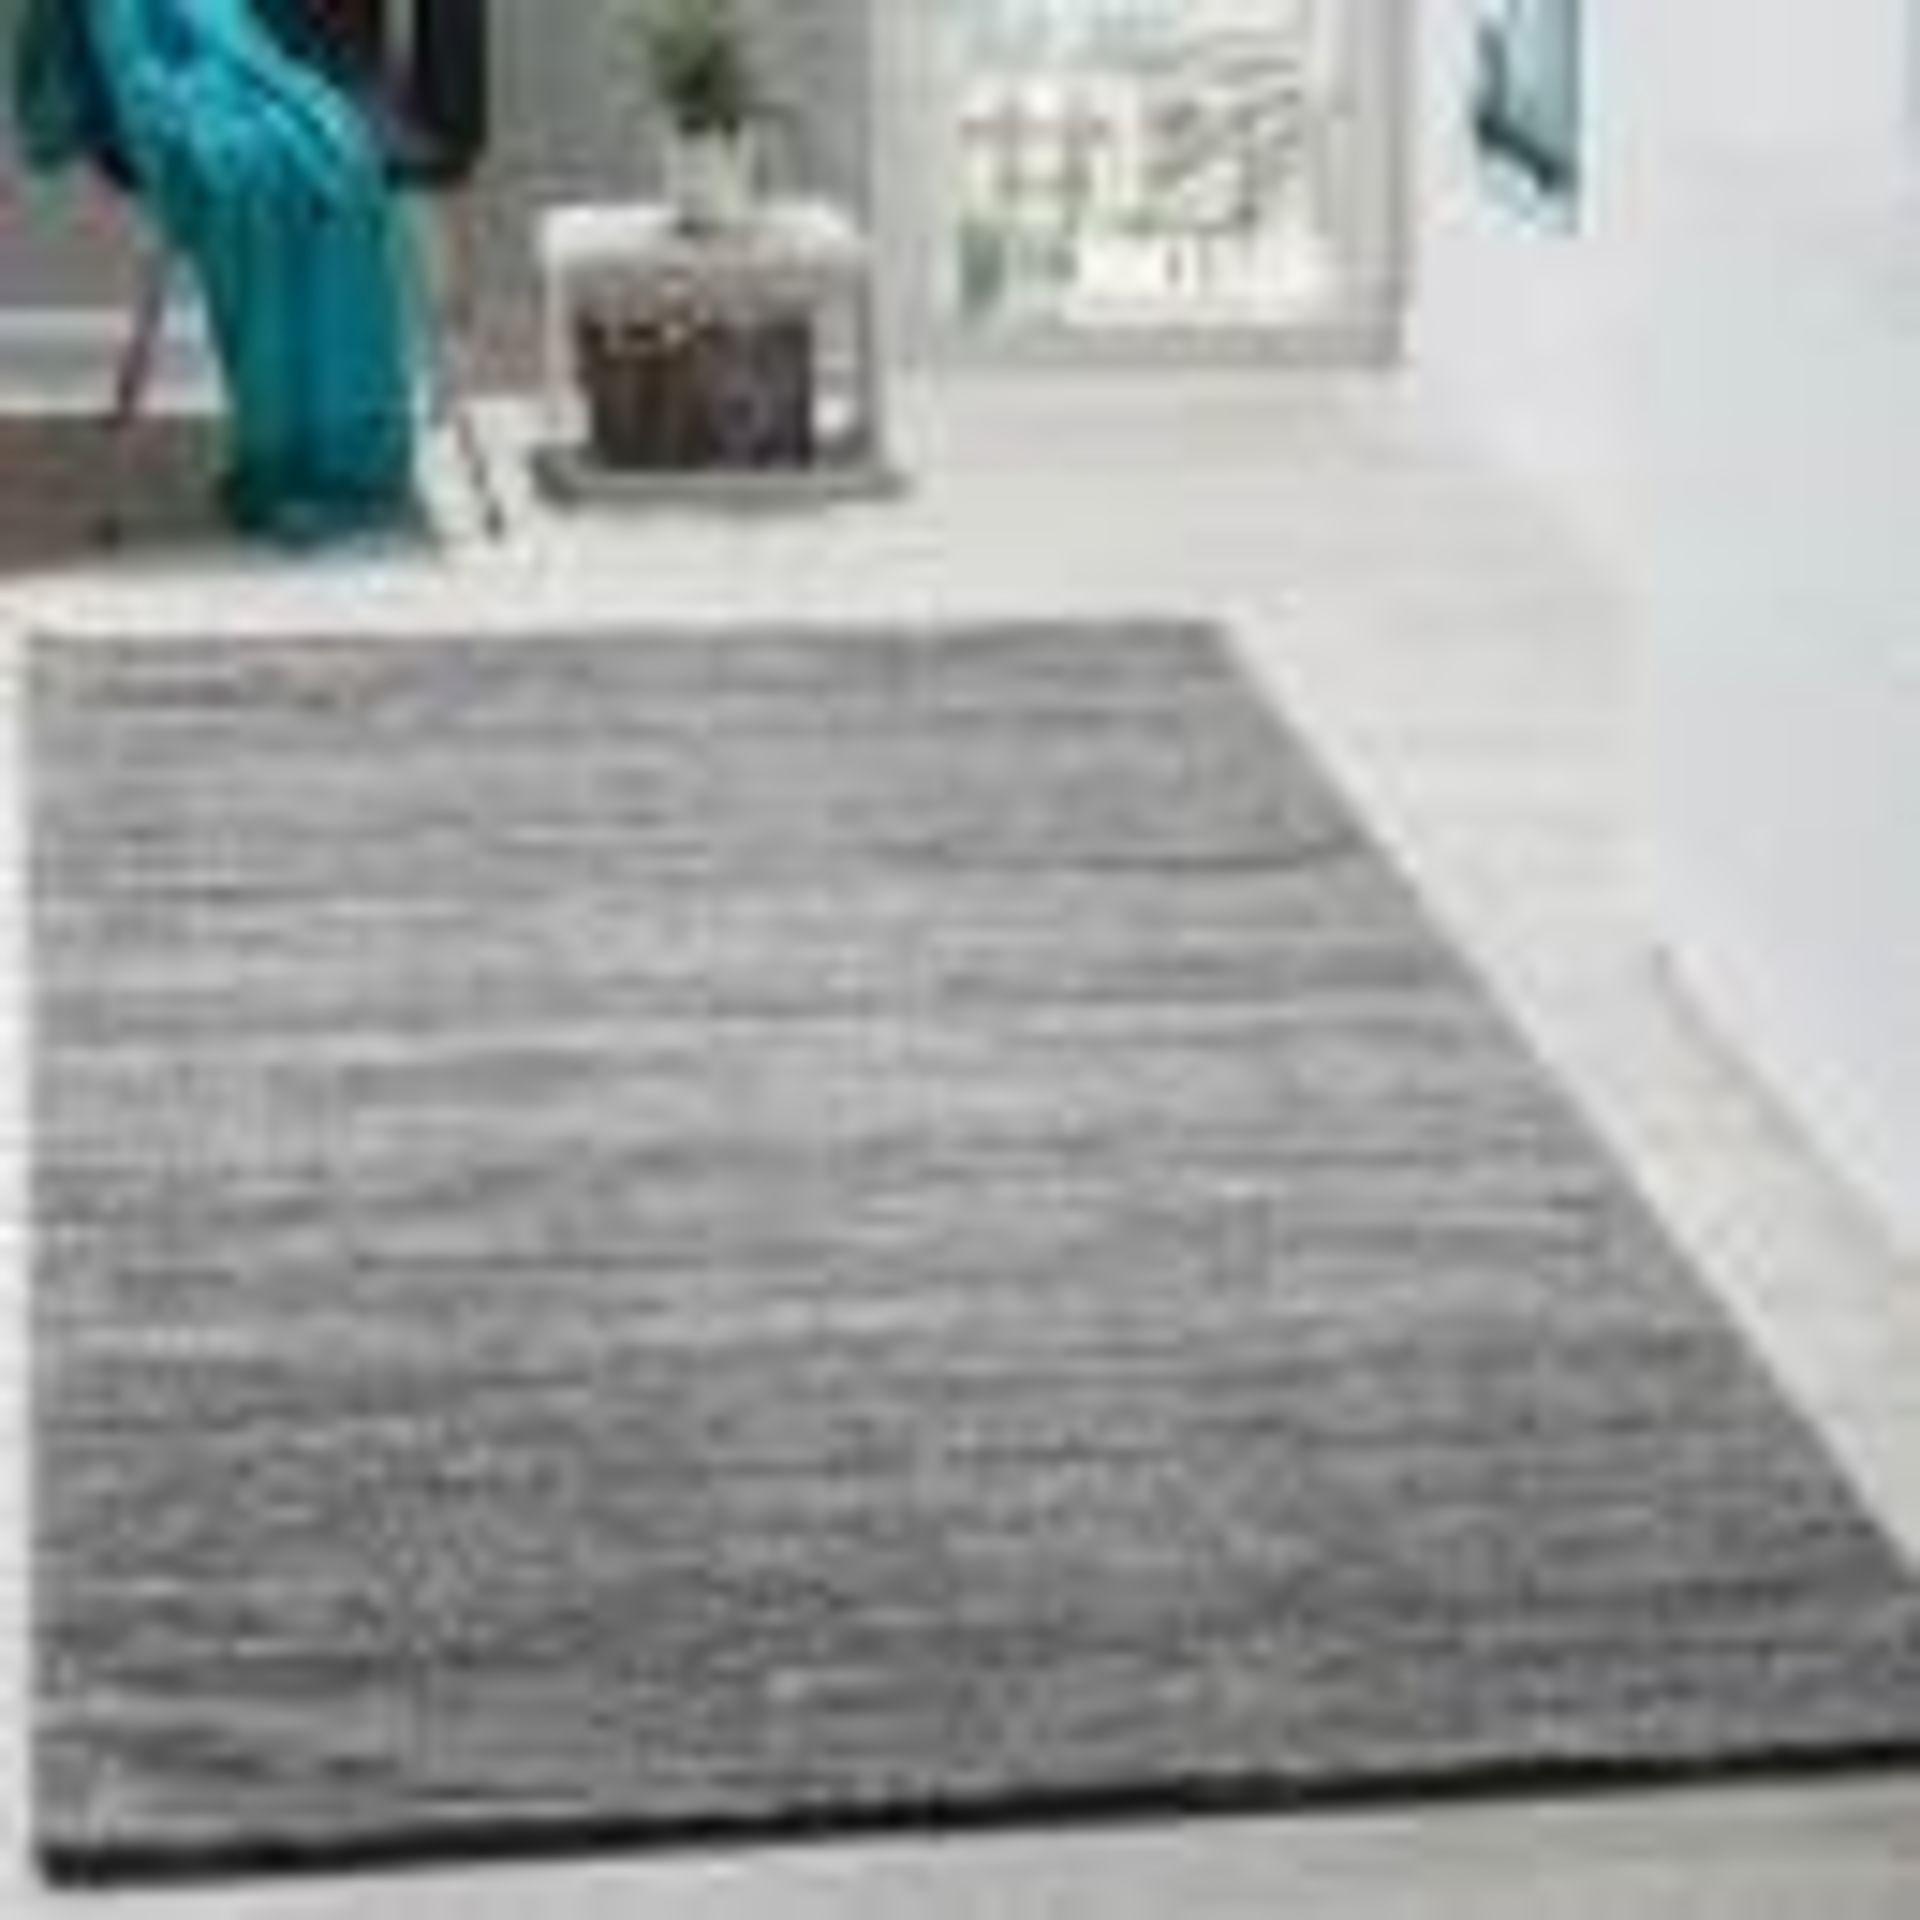 Kiana Grey Rug Size: Runner 70 x 250cm (HL7 -1/27 -ALAS6851.32466584)